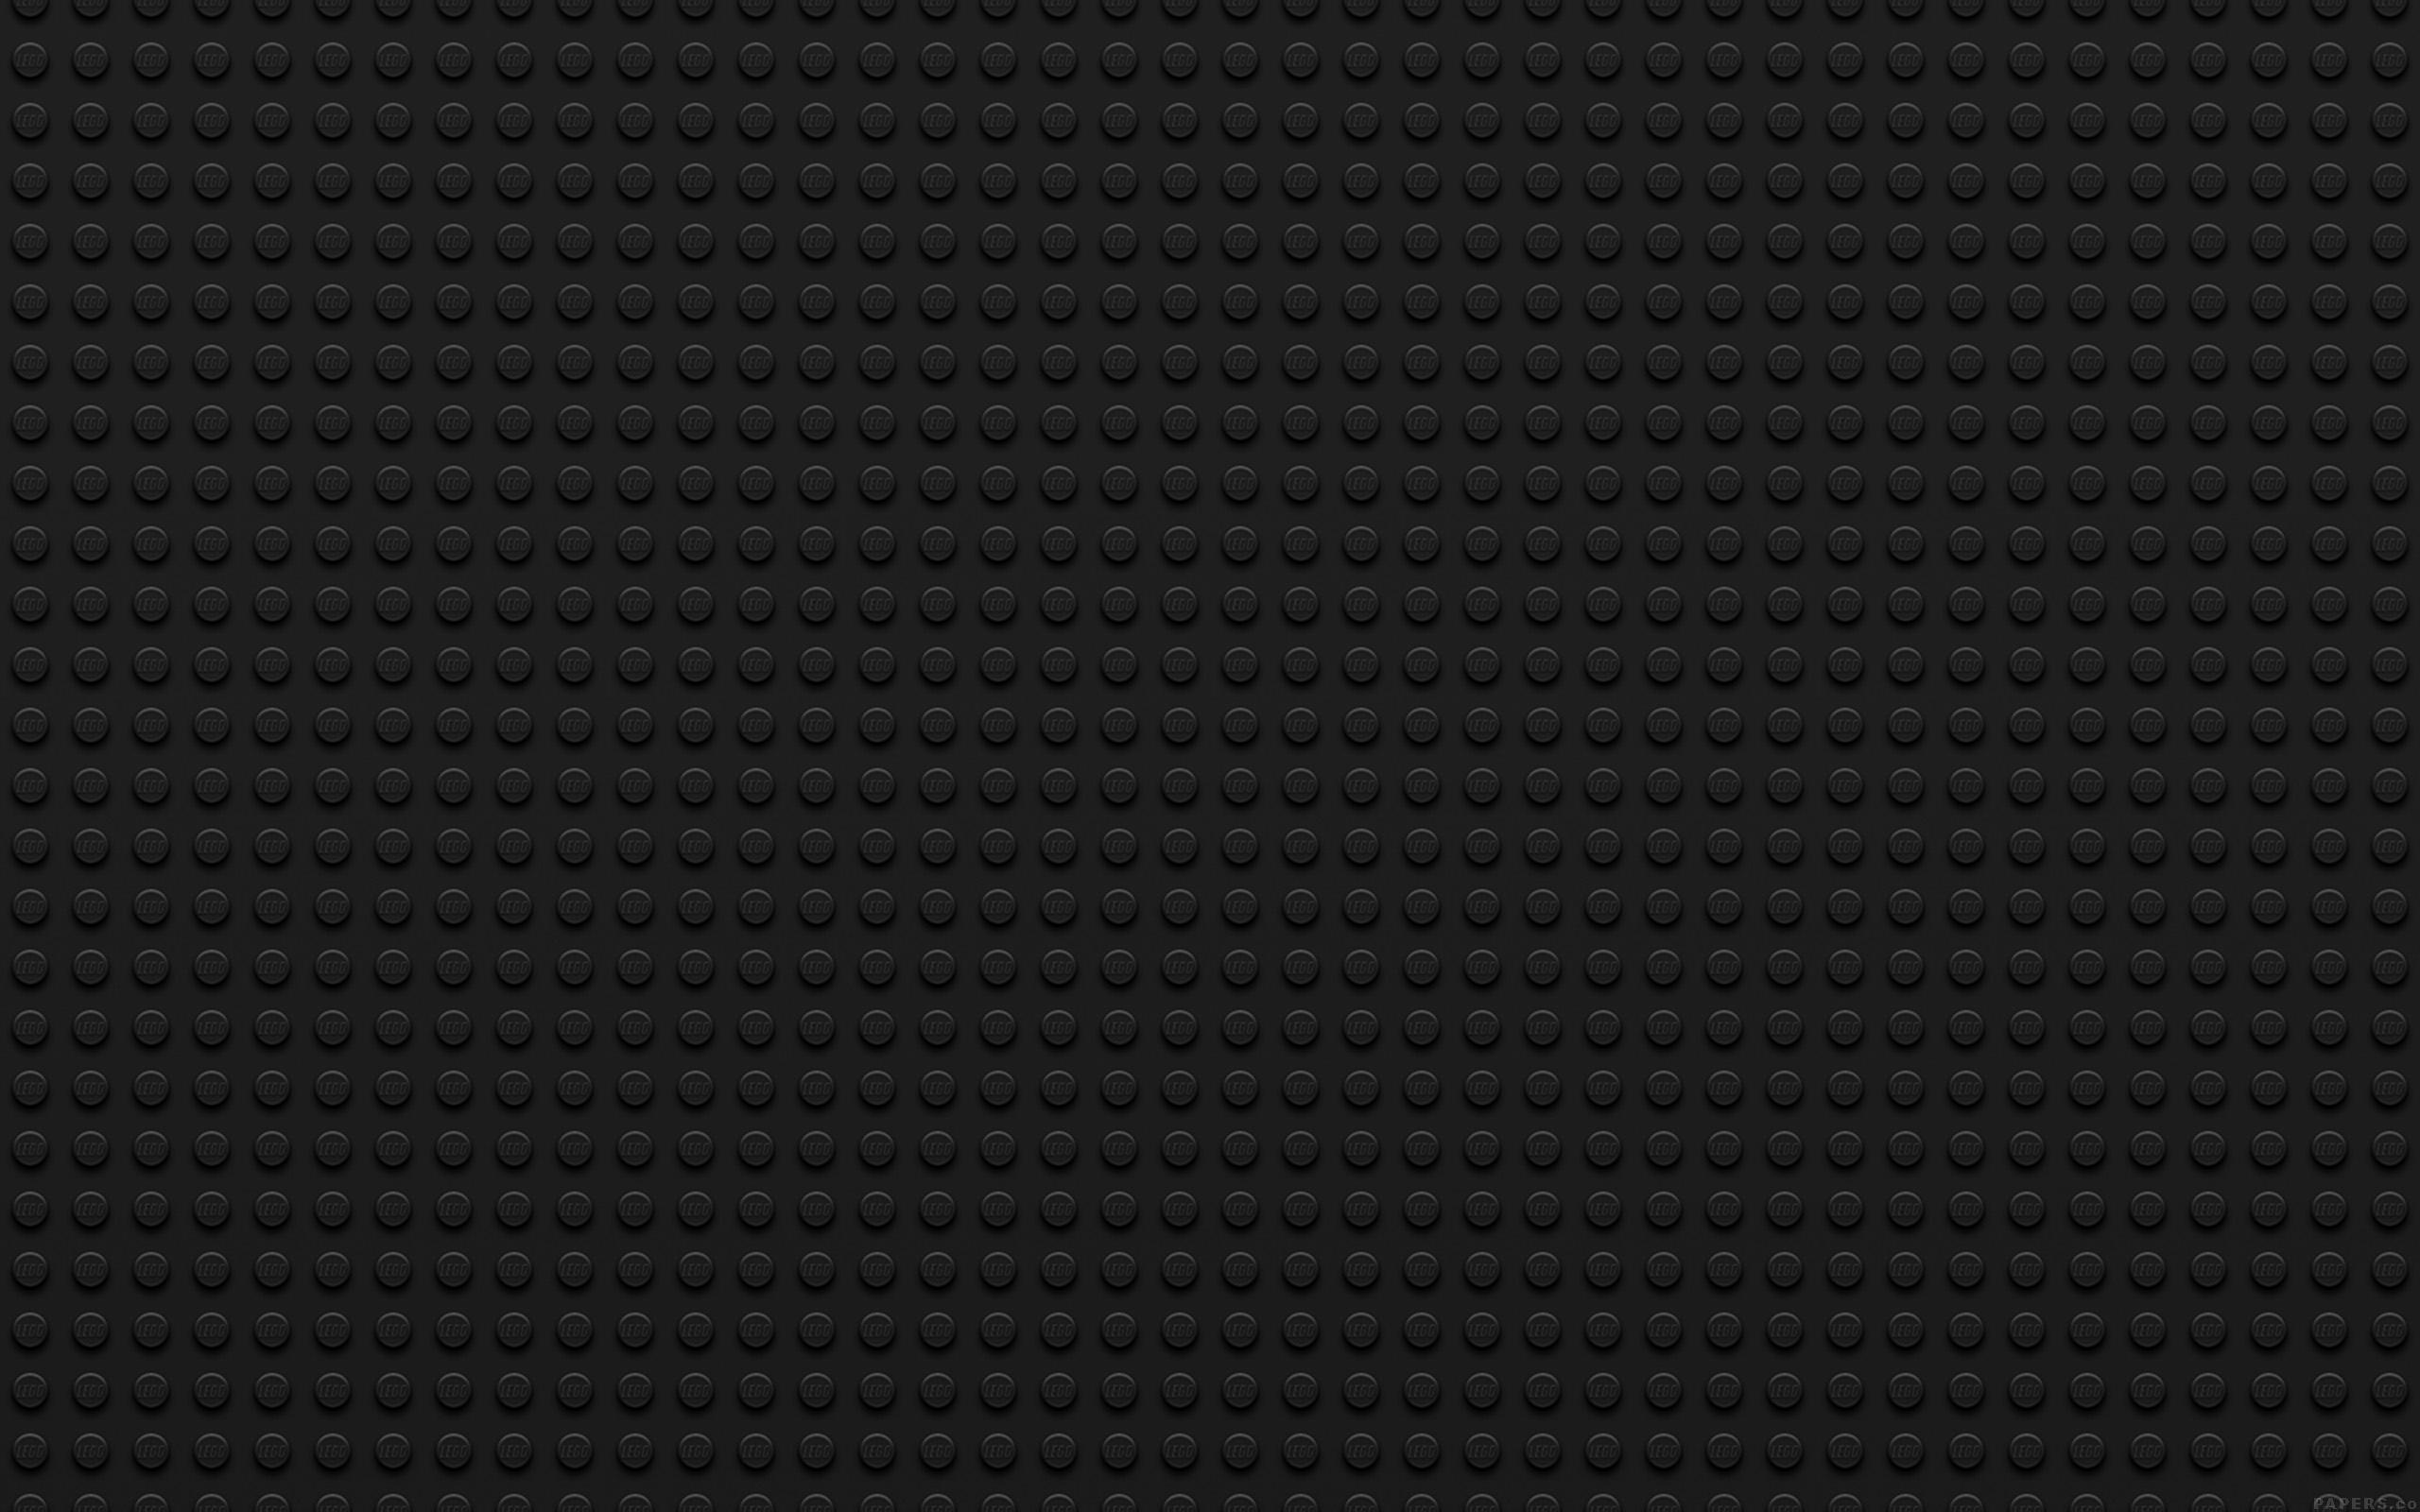 vf35-lego-toy-dark-black-block-pattern - Papers.co